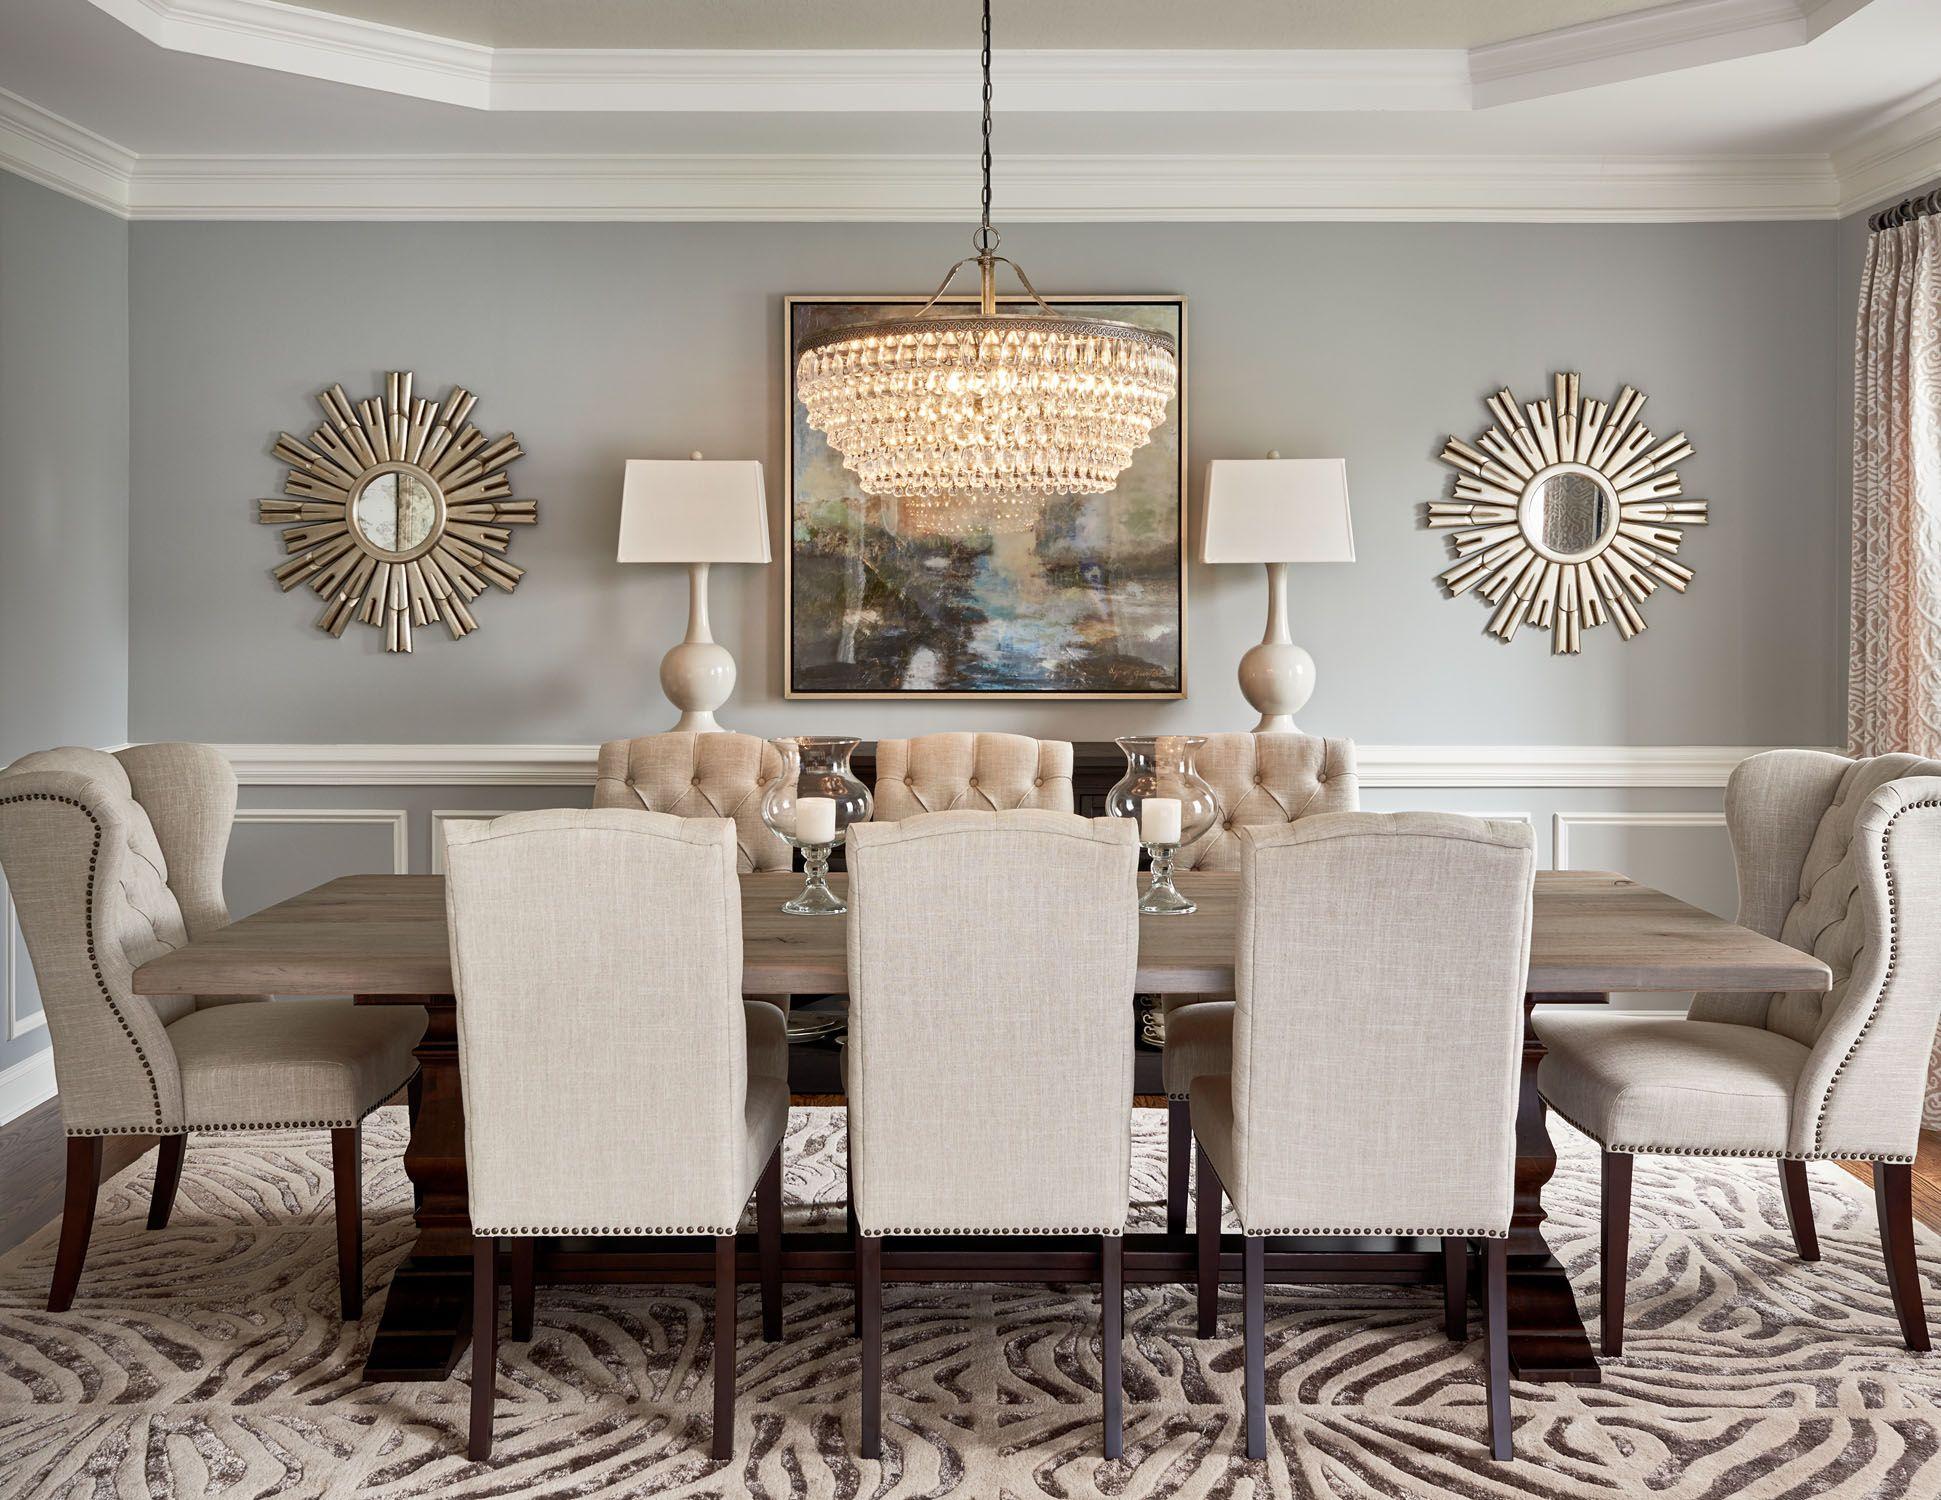 charlotte interior designers asid interior decorators charlotte nc rh pinterest com